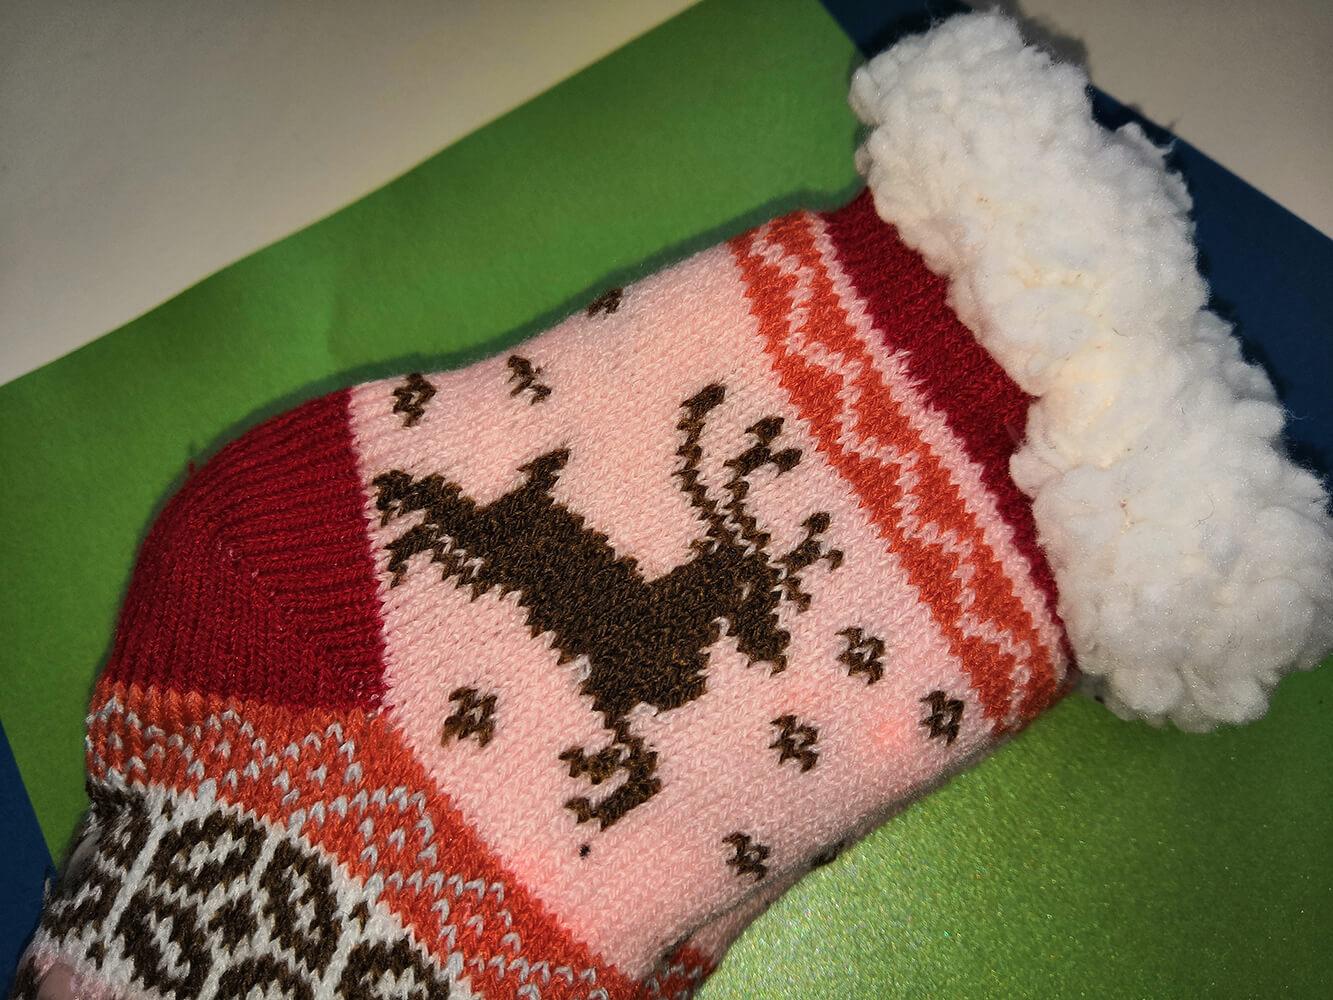 Детские носки-тапочки Emi Ross EJ-6208-r красного цвета. 27-31 размера. Фото 2